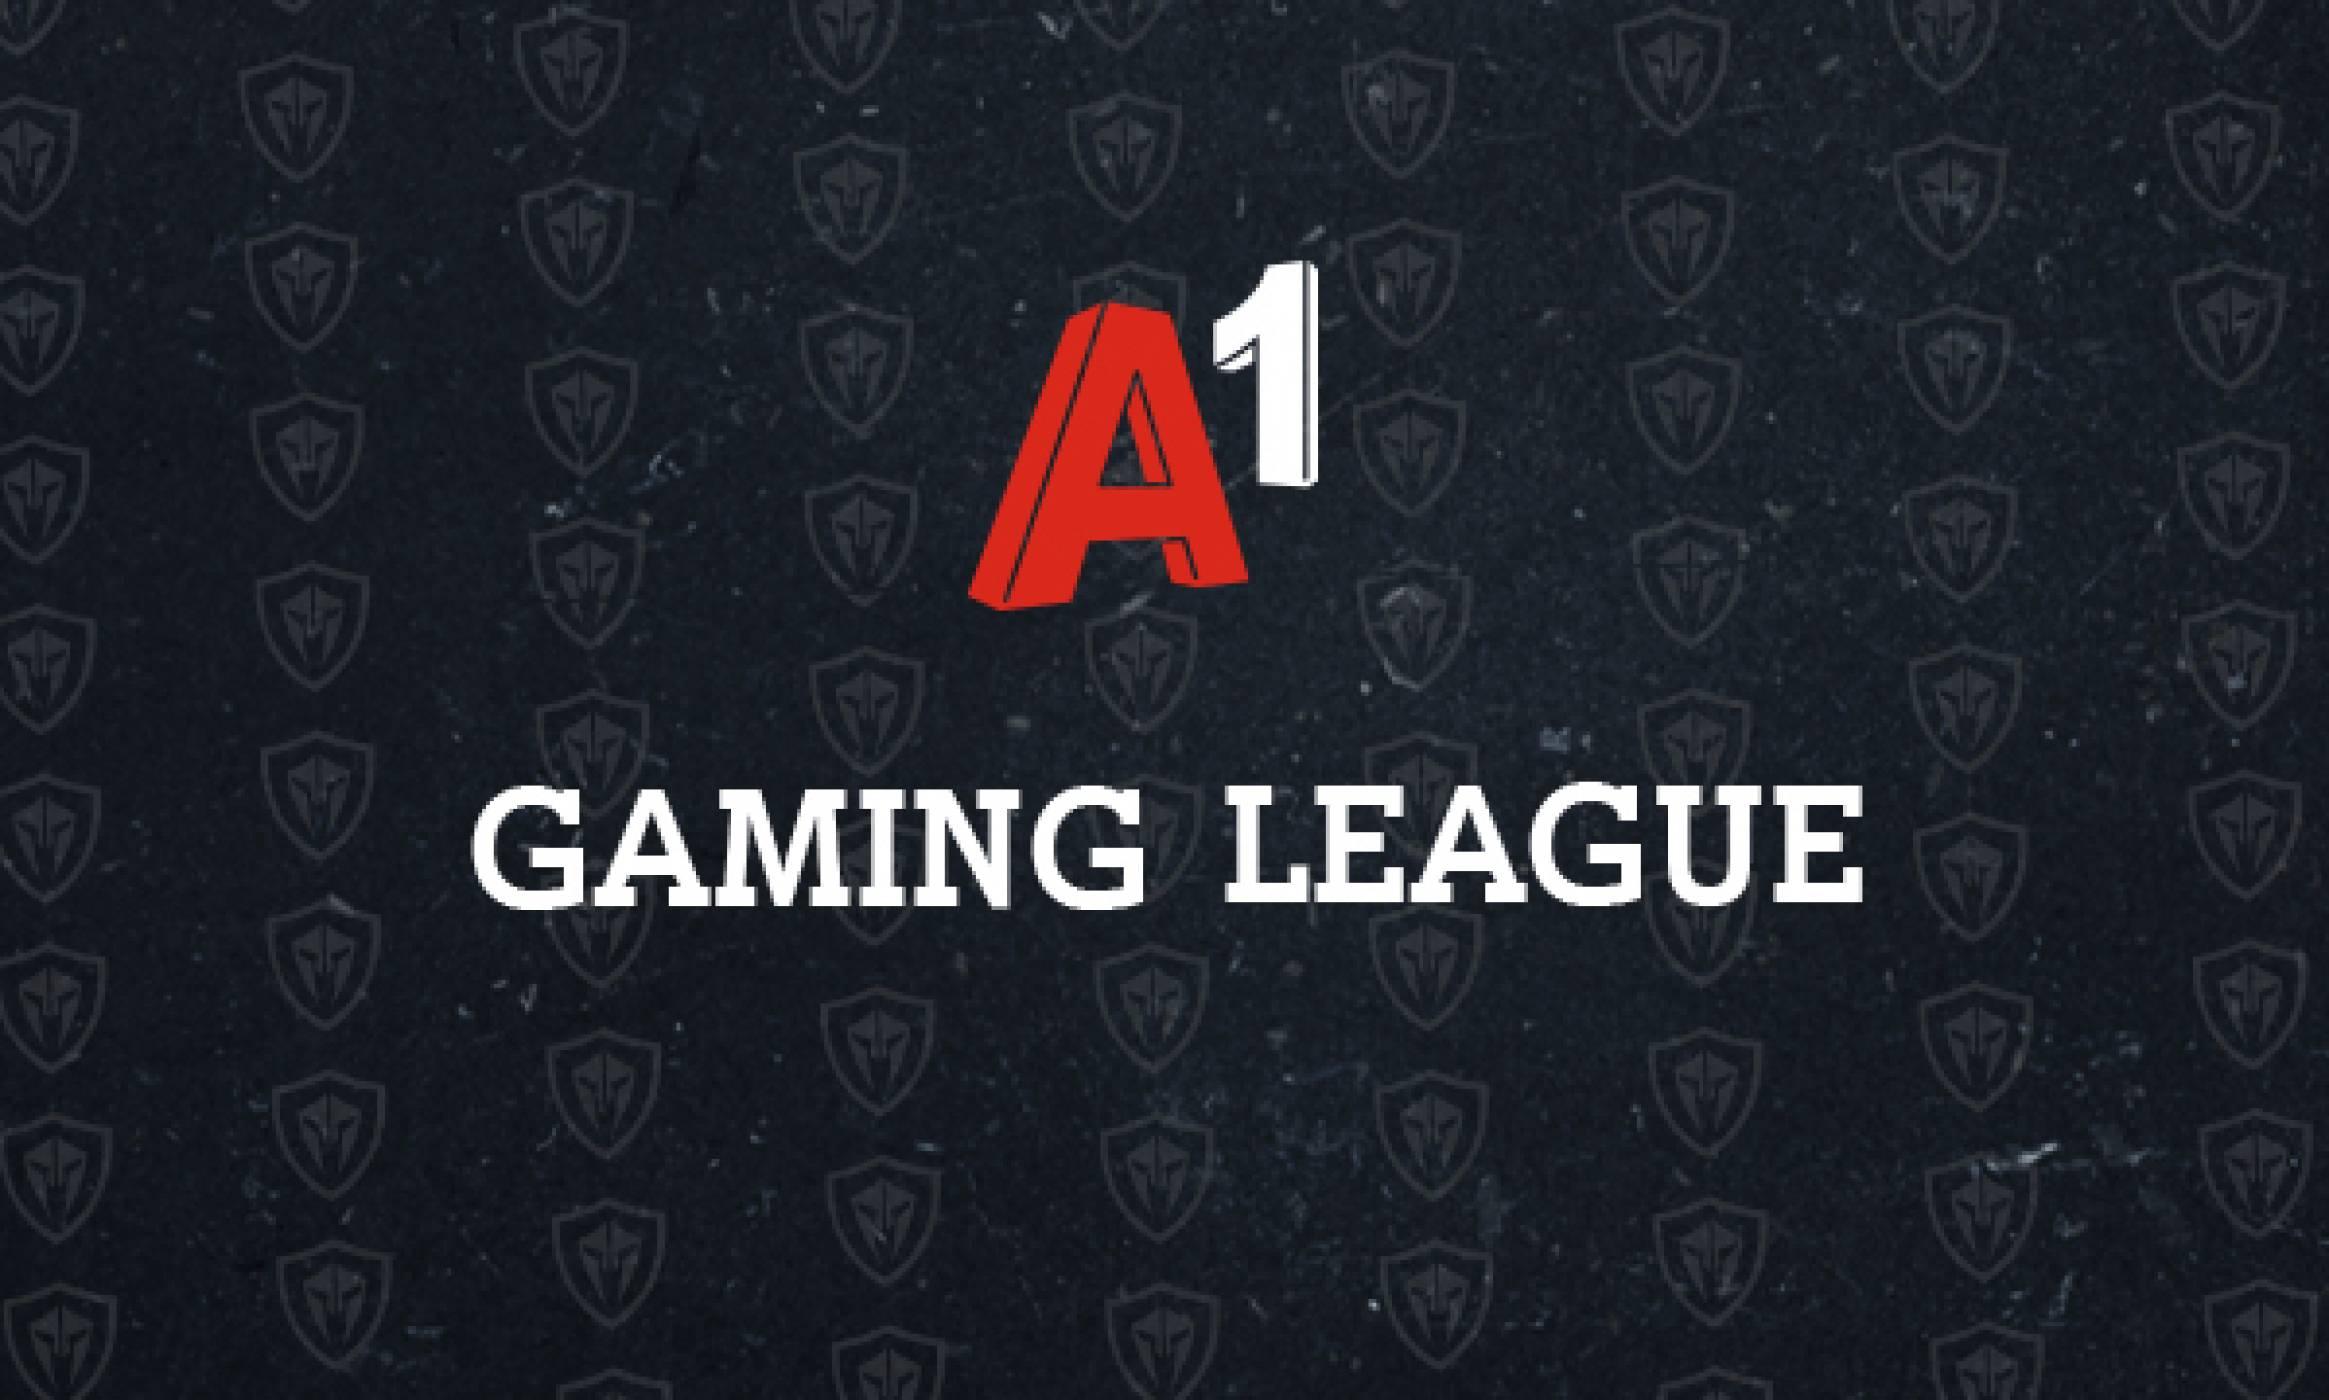 A1 даде началото на собствена гейминг лига